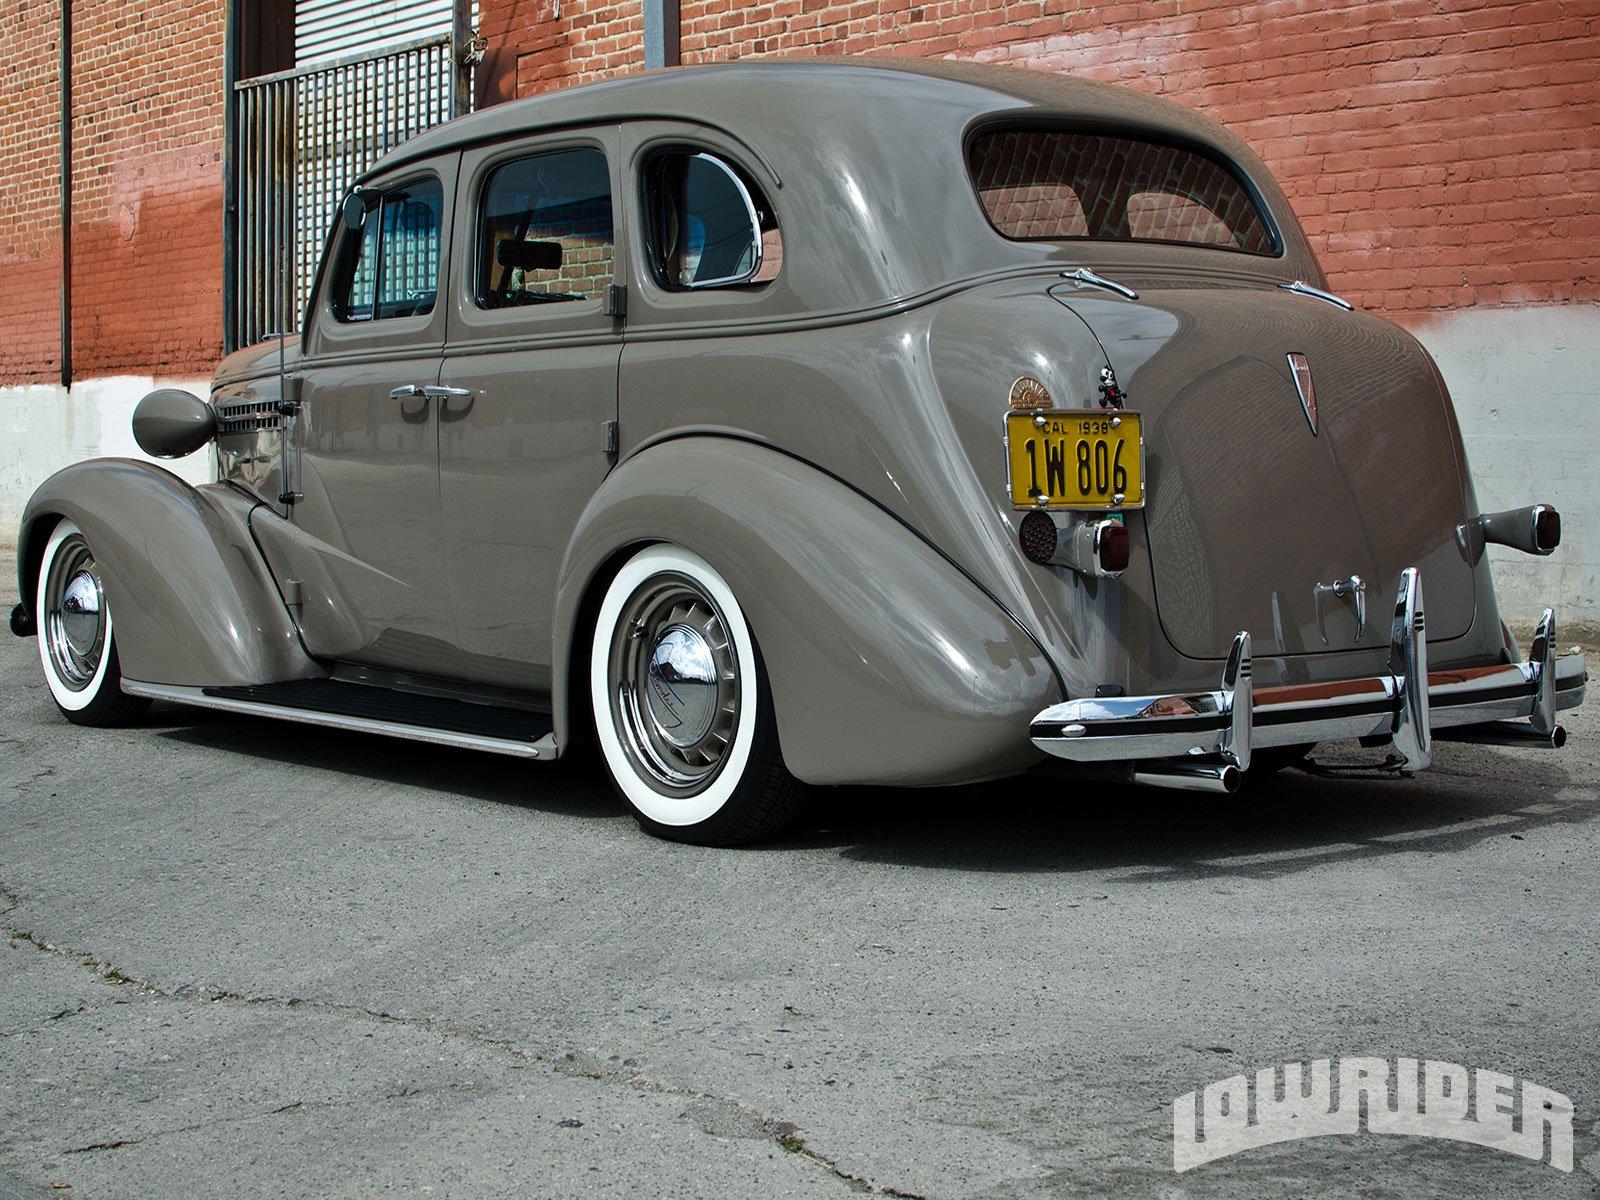 1938 chevrolet master deluxe custom tuning hot rods rod for 1936 chevy master deluxe 4 door for sale